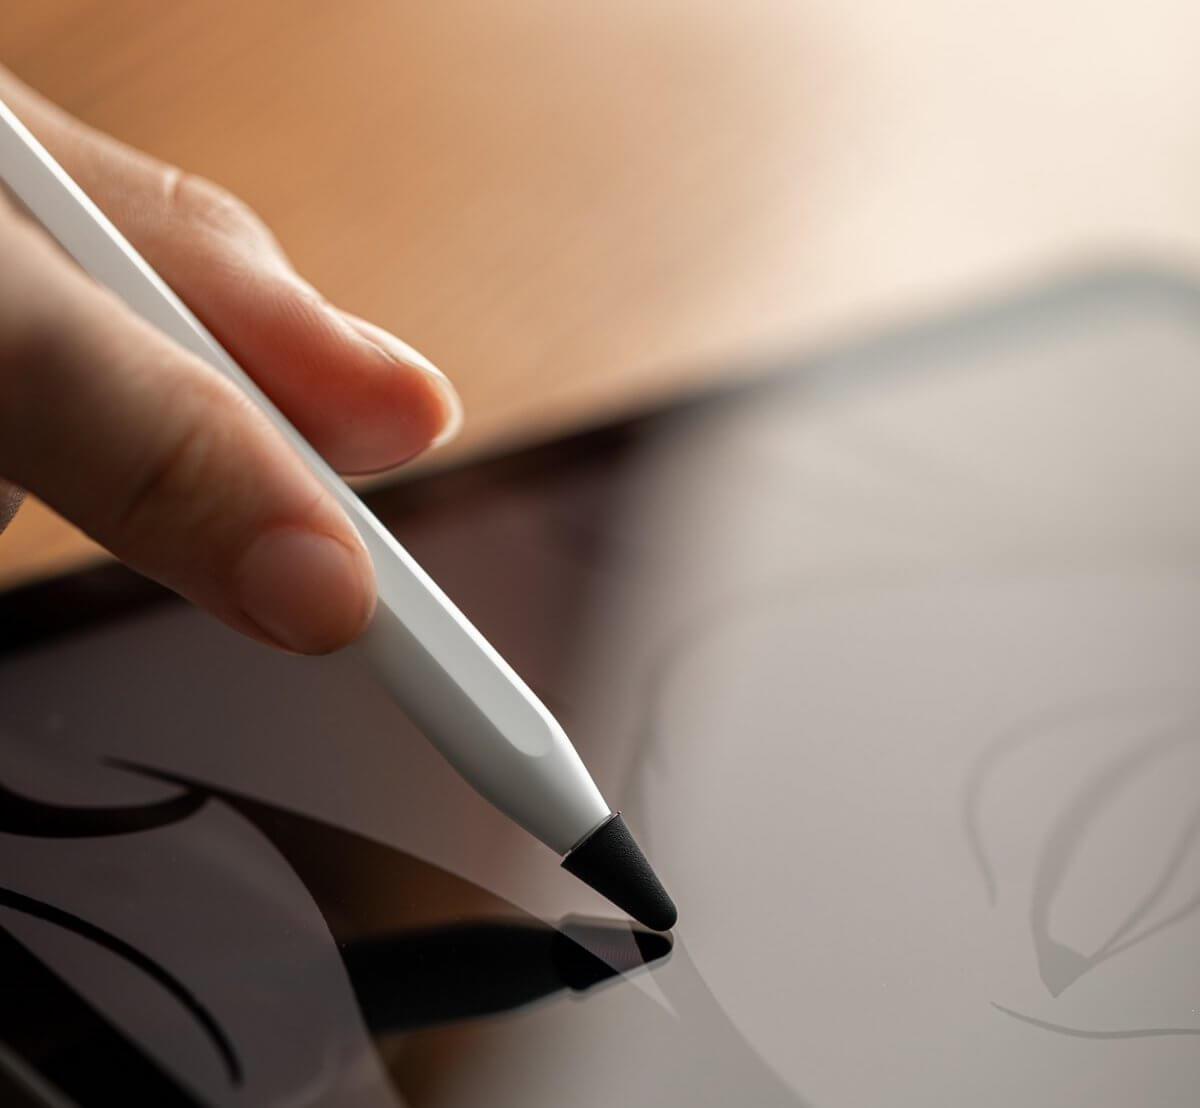 pen-tips-ipad-drawing-101321